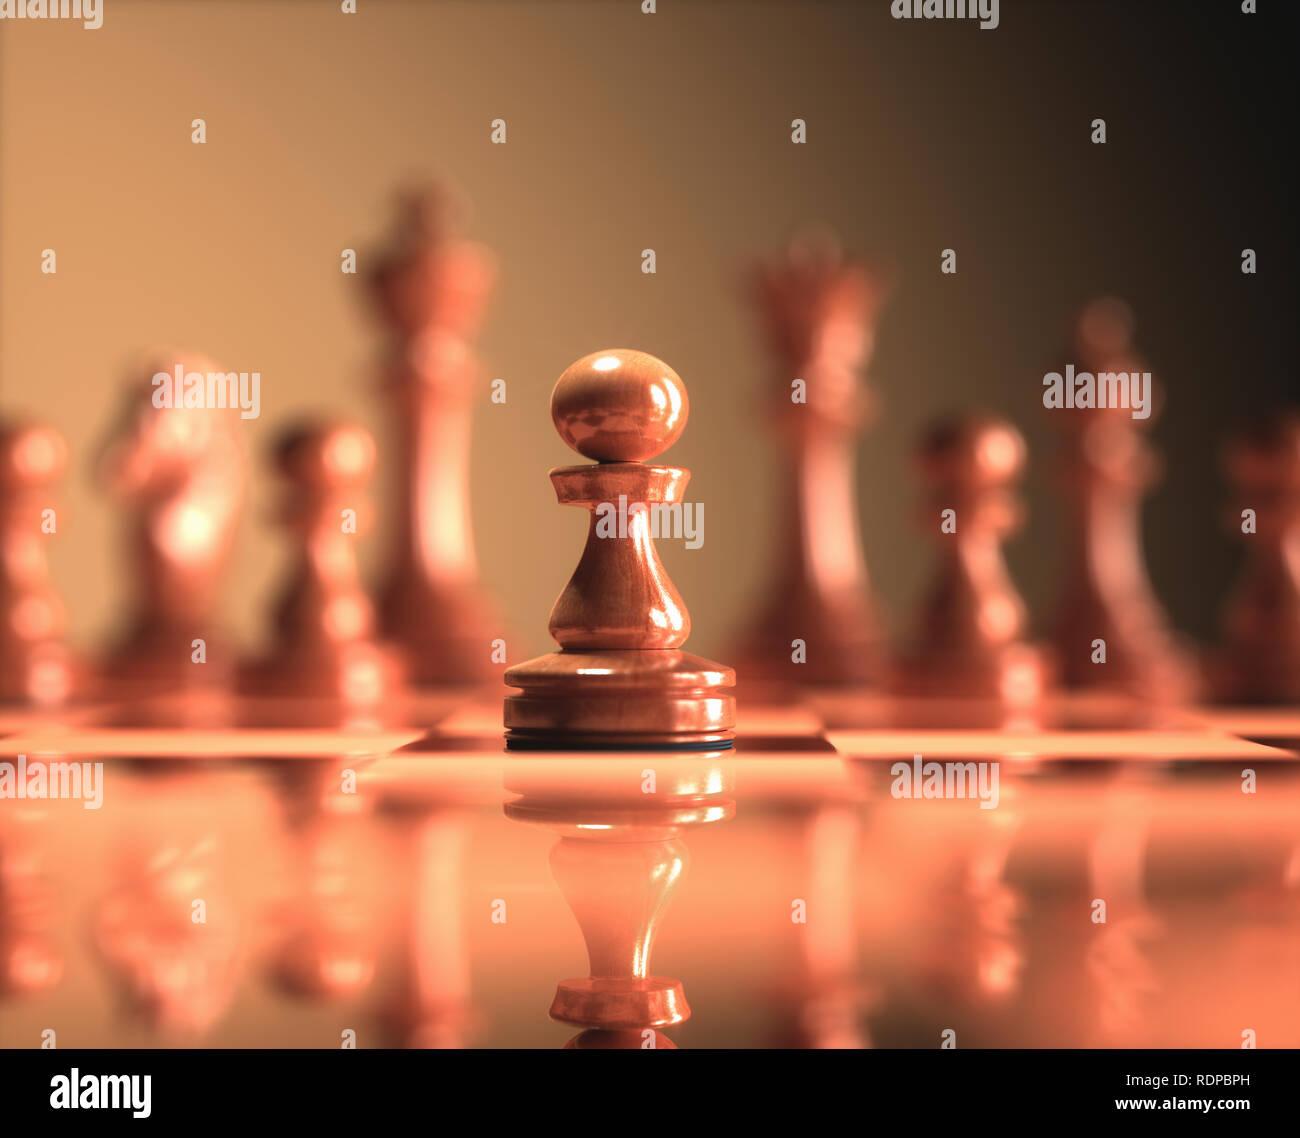 Chess pawn, illustration. - Stock Image